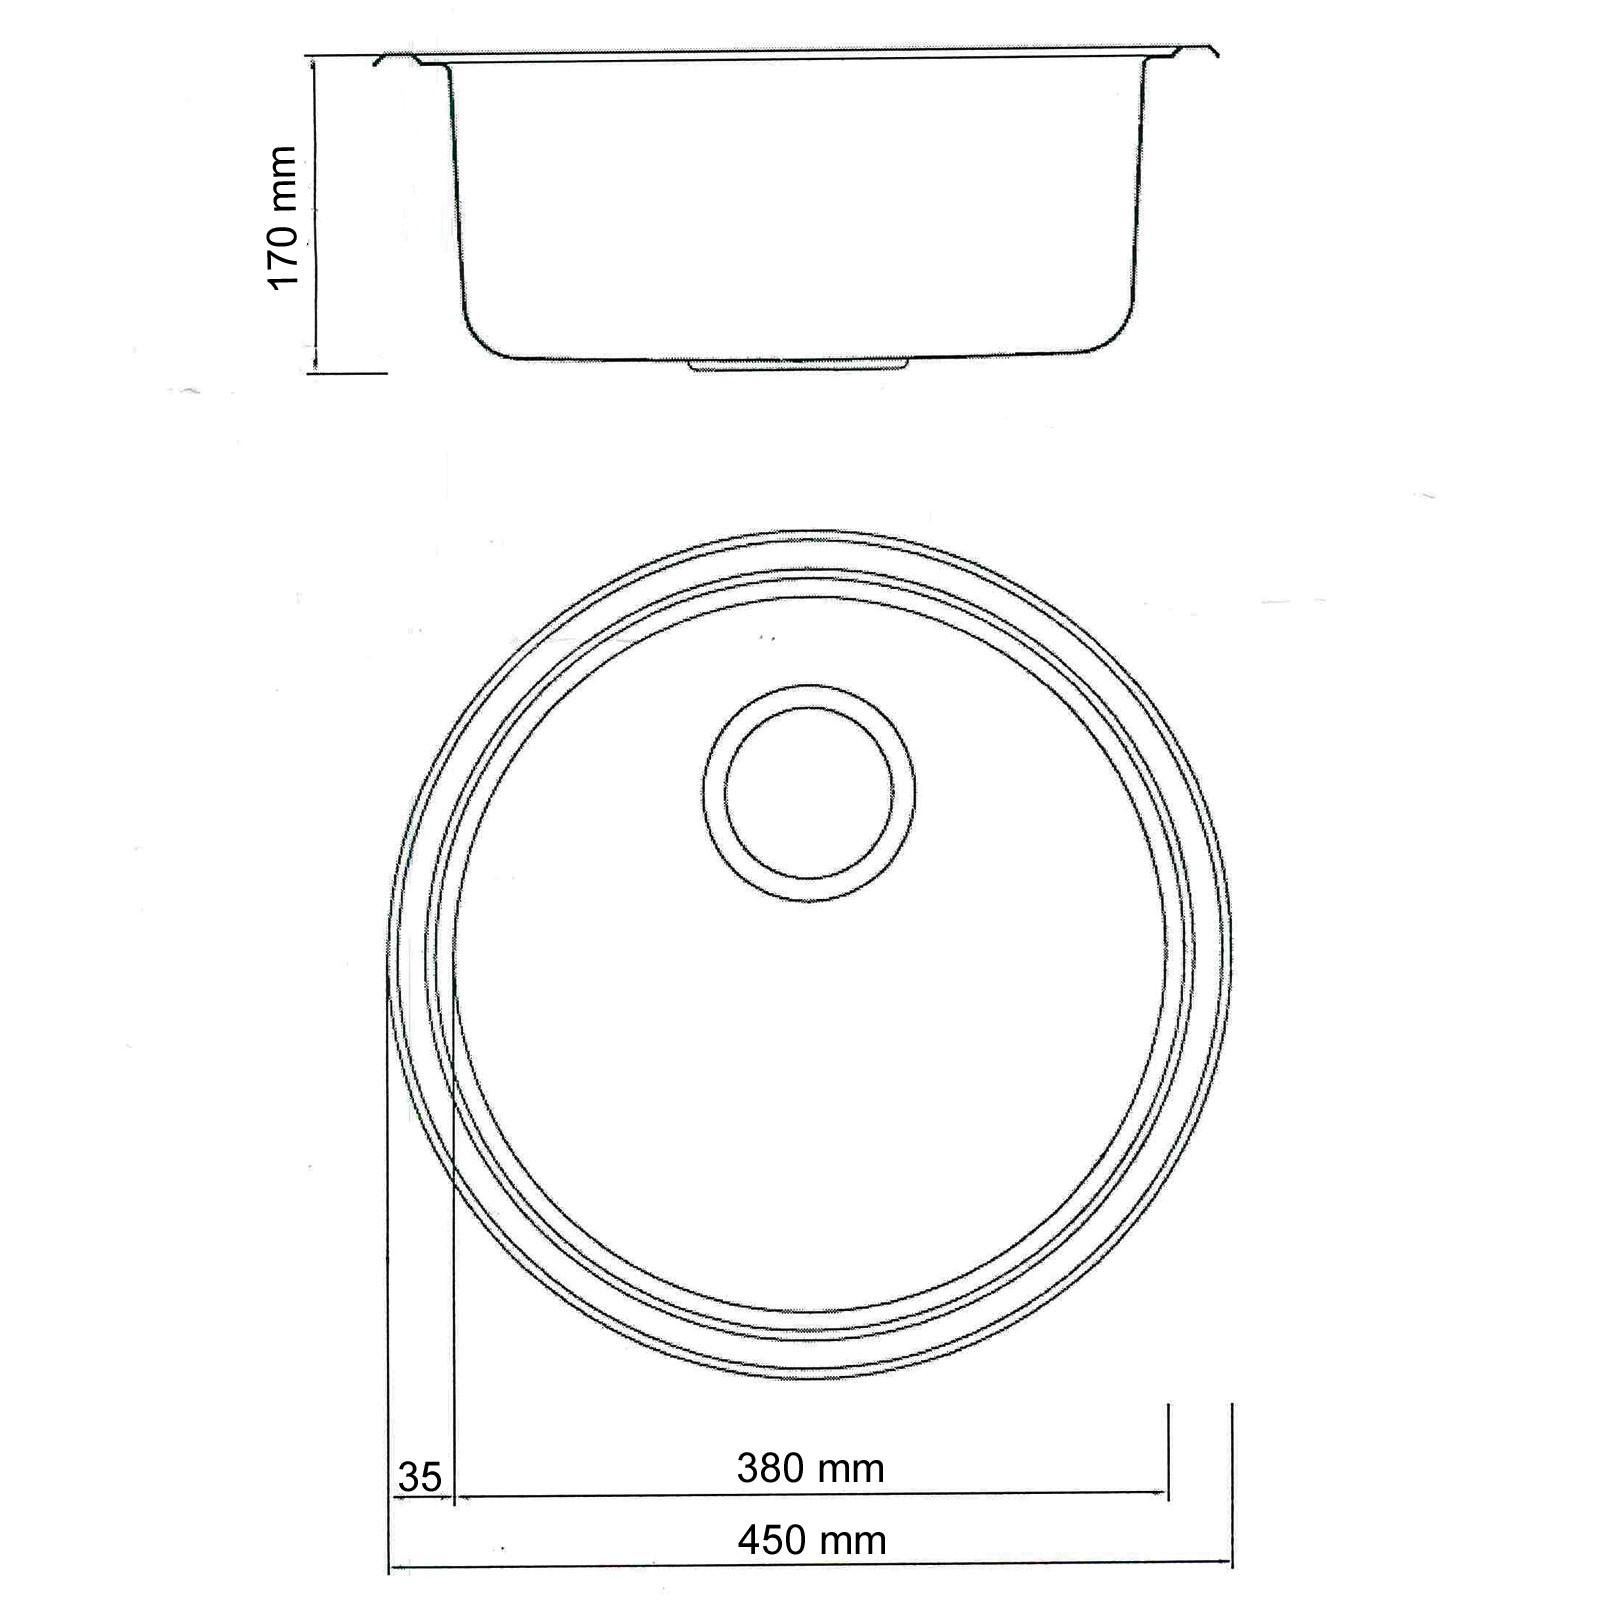 Edelstahl Einbauspüle Ronda1 Waschbecken Spüle Küchenspüle